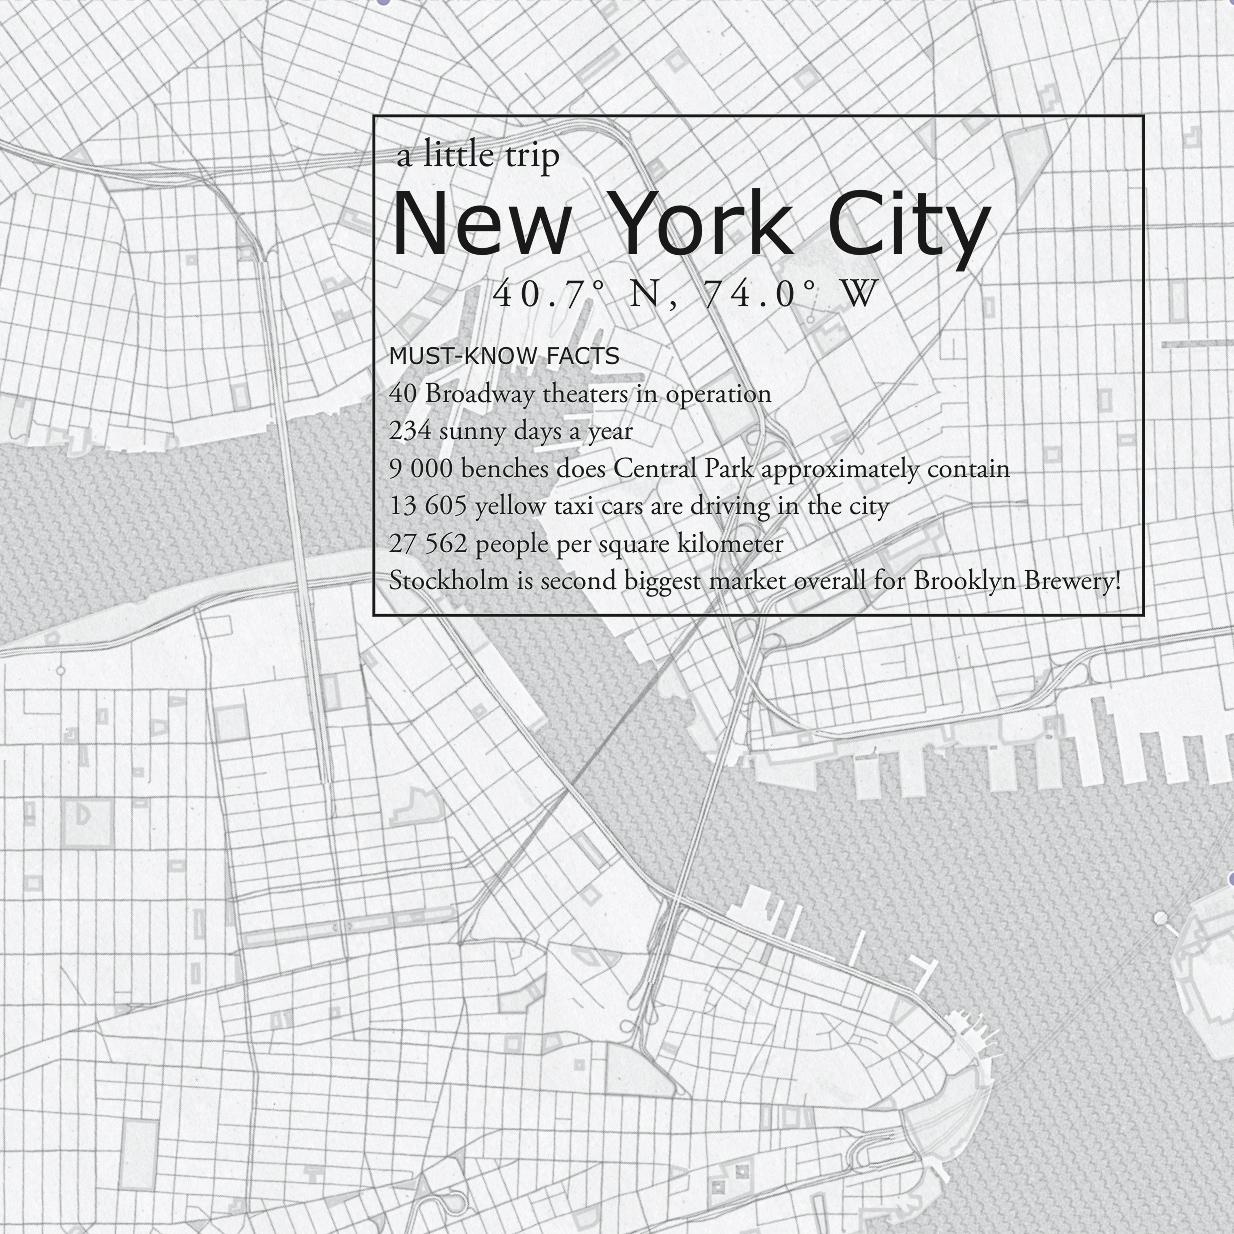 New York NYC printable mini guide city guide hello getaway